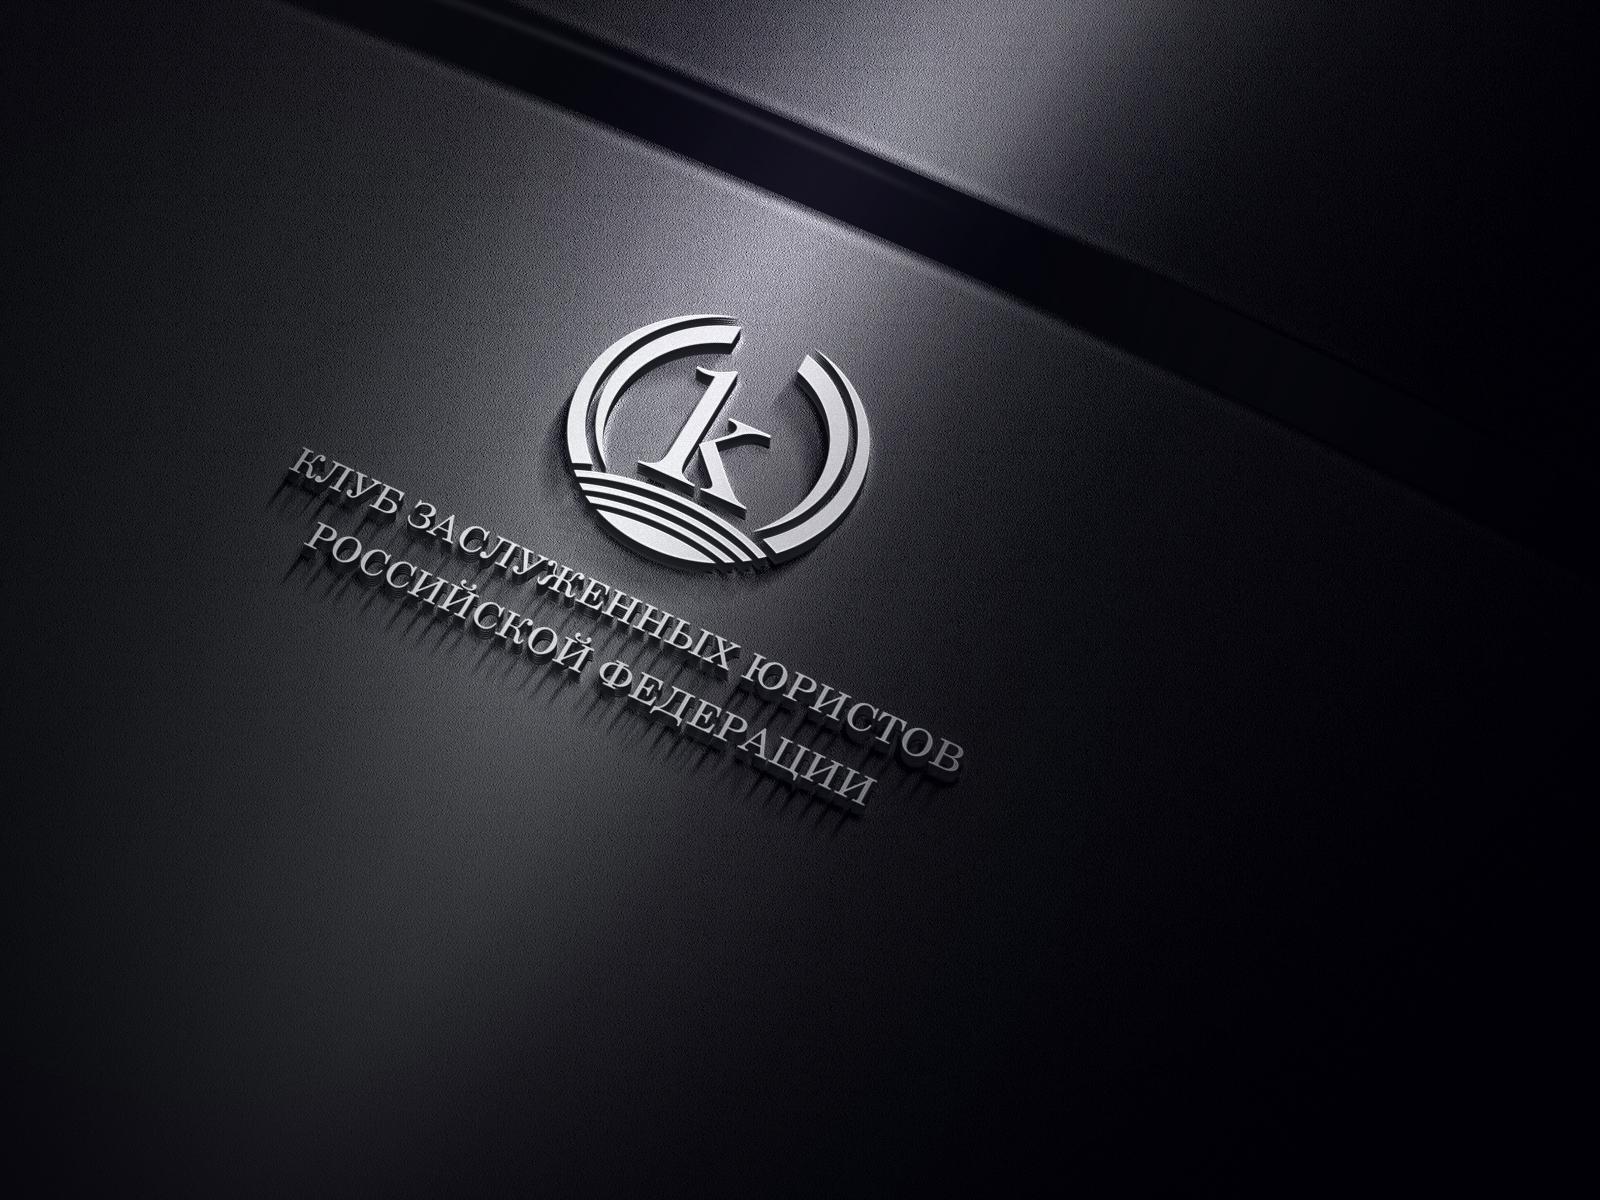 Разработка логотипа Совета (Клуба) заслуженных юристов Российской Федерации фото f_4255e413b52b6c93.jpg